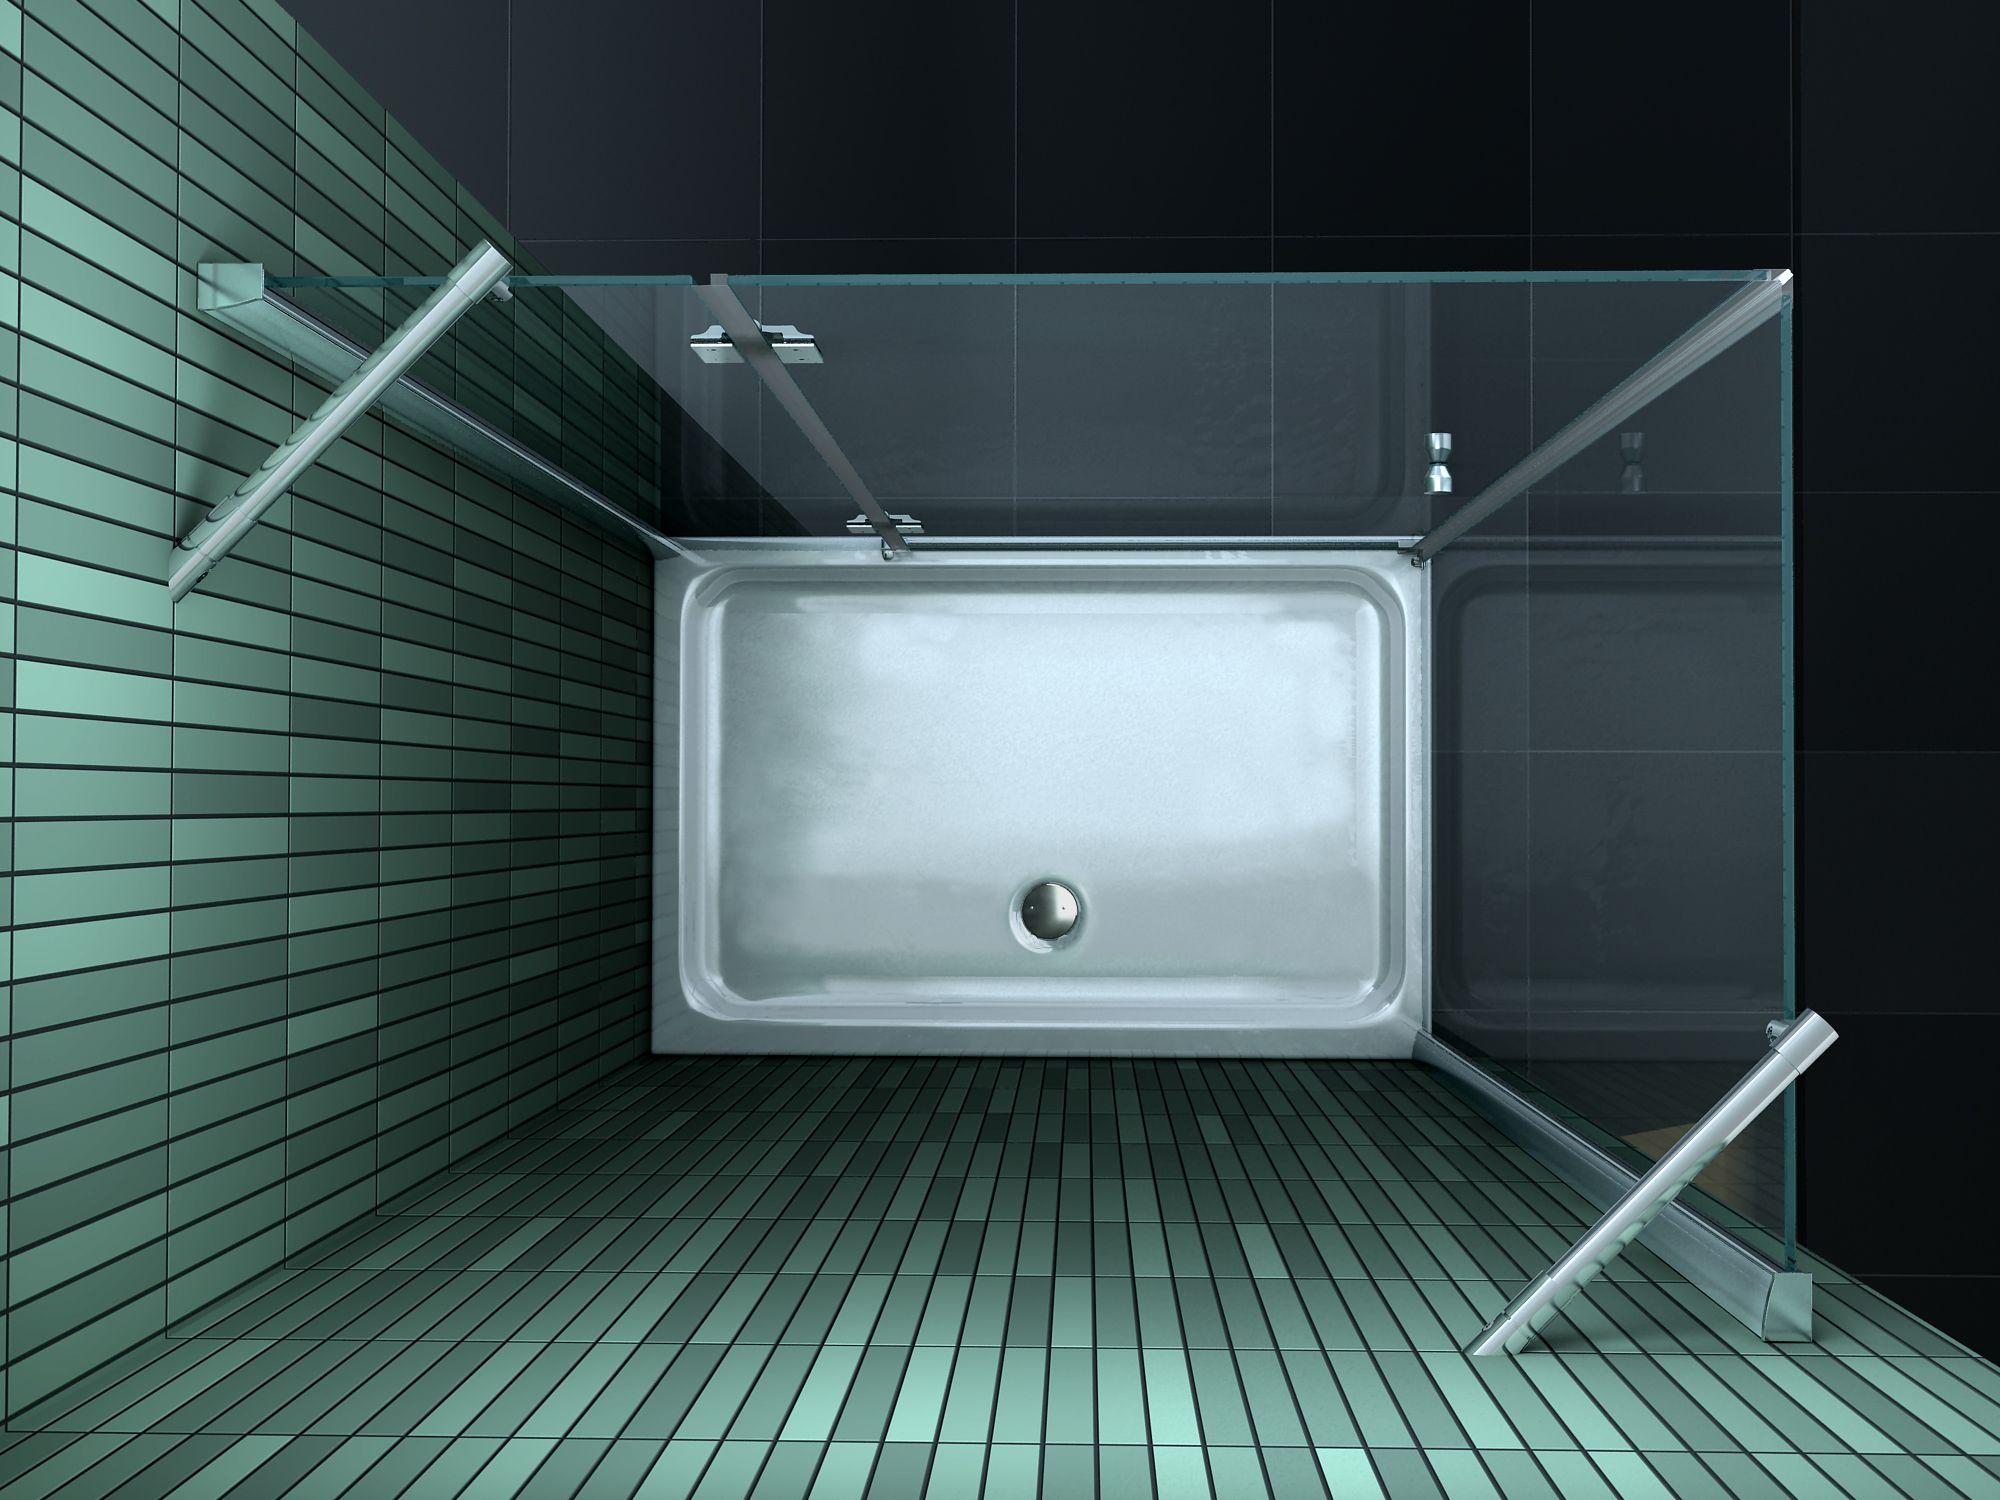 komplett duschkabine 100 80 smartpersoneelsdossier. Black Bedroom Furniture Sets. Home Design Ideas